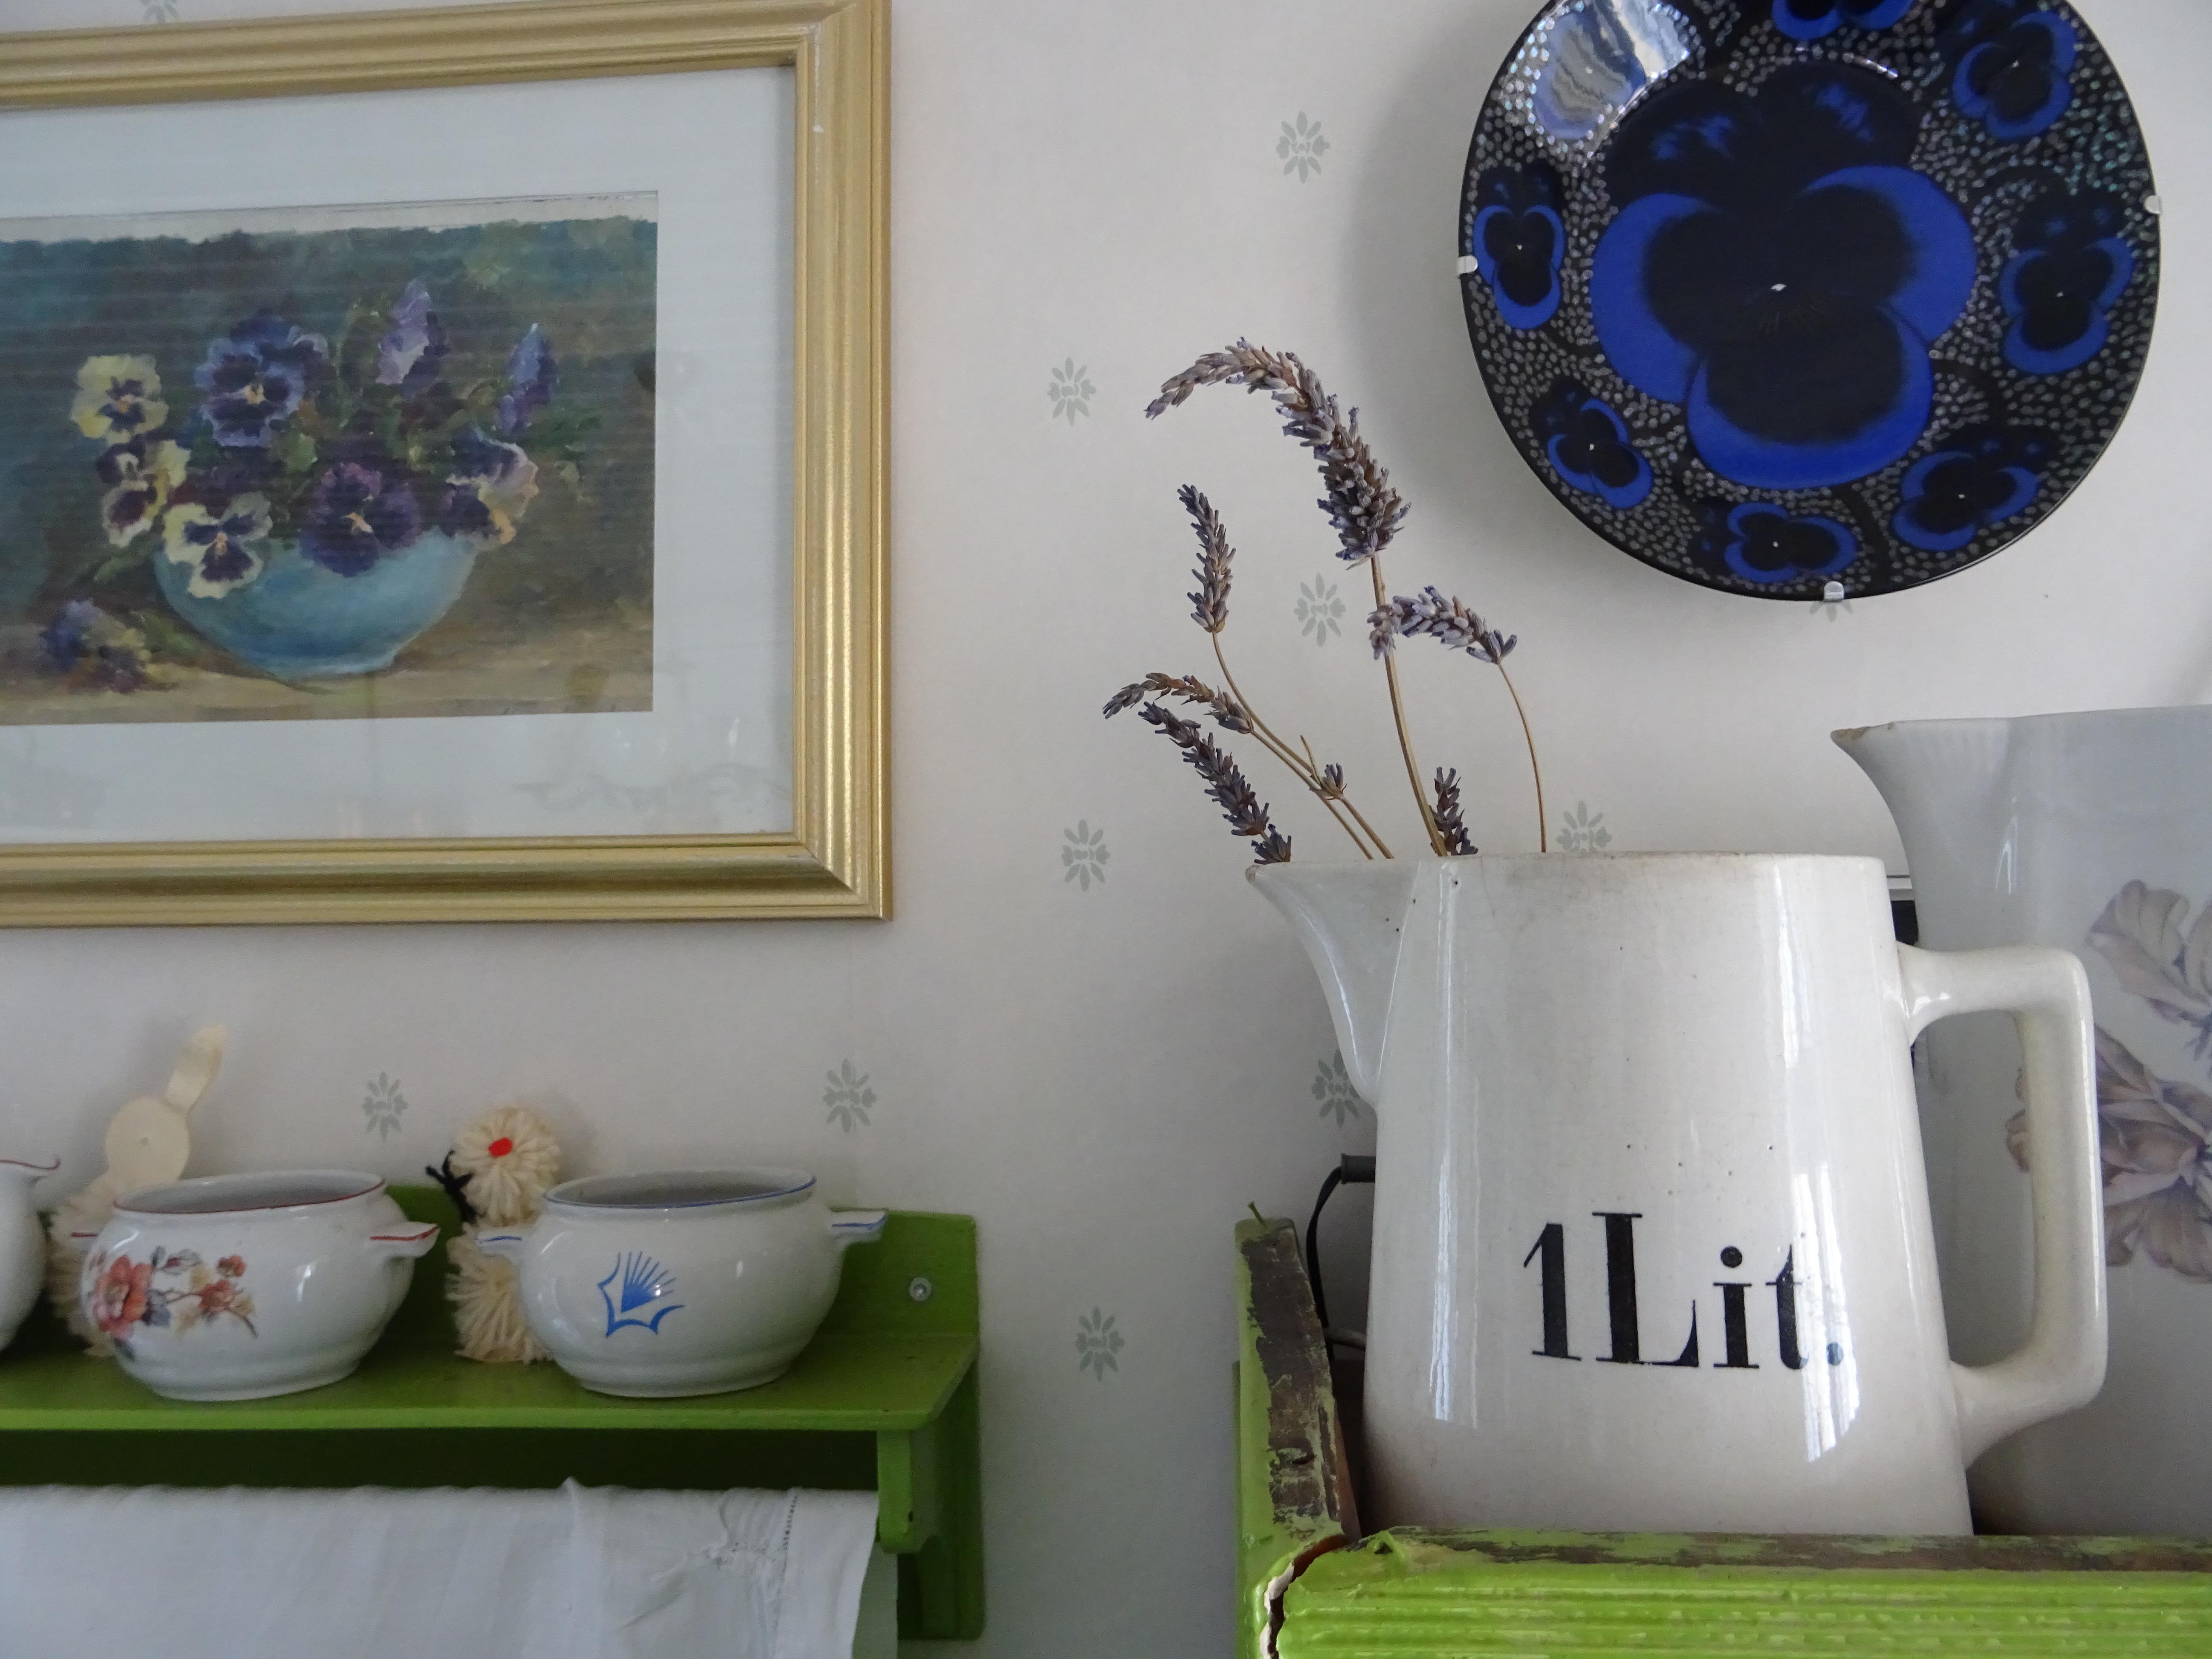 Orvokkeja ja laventelia